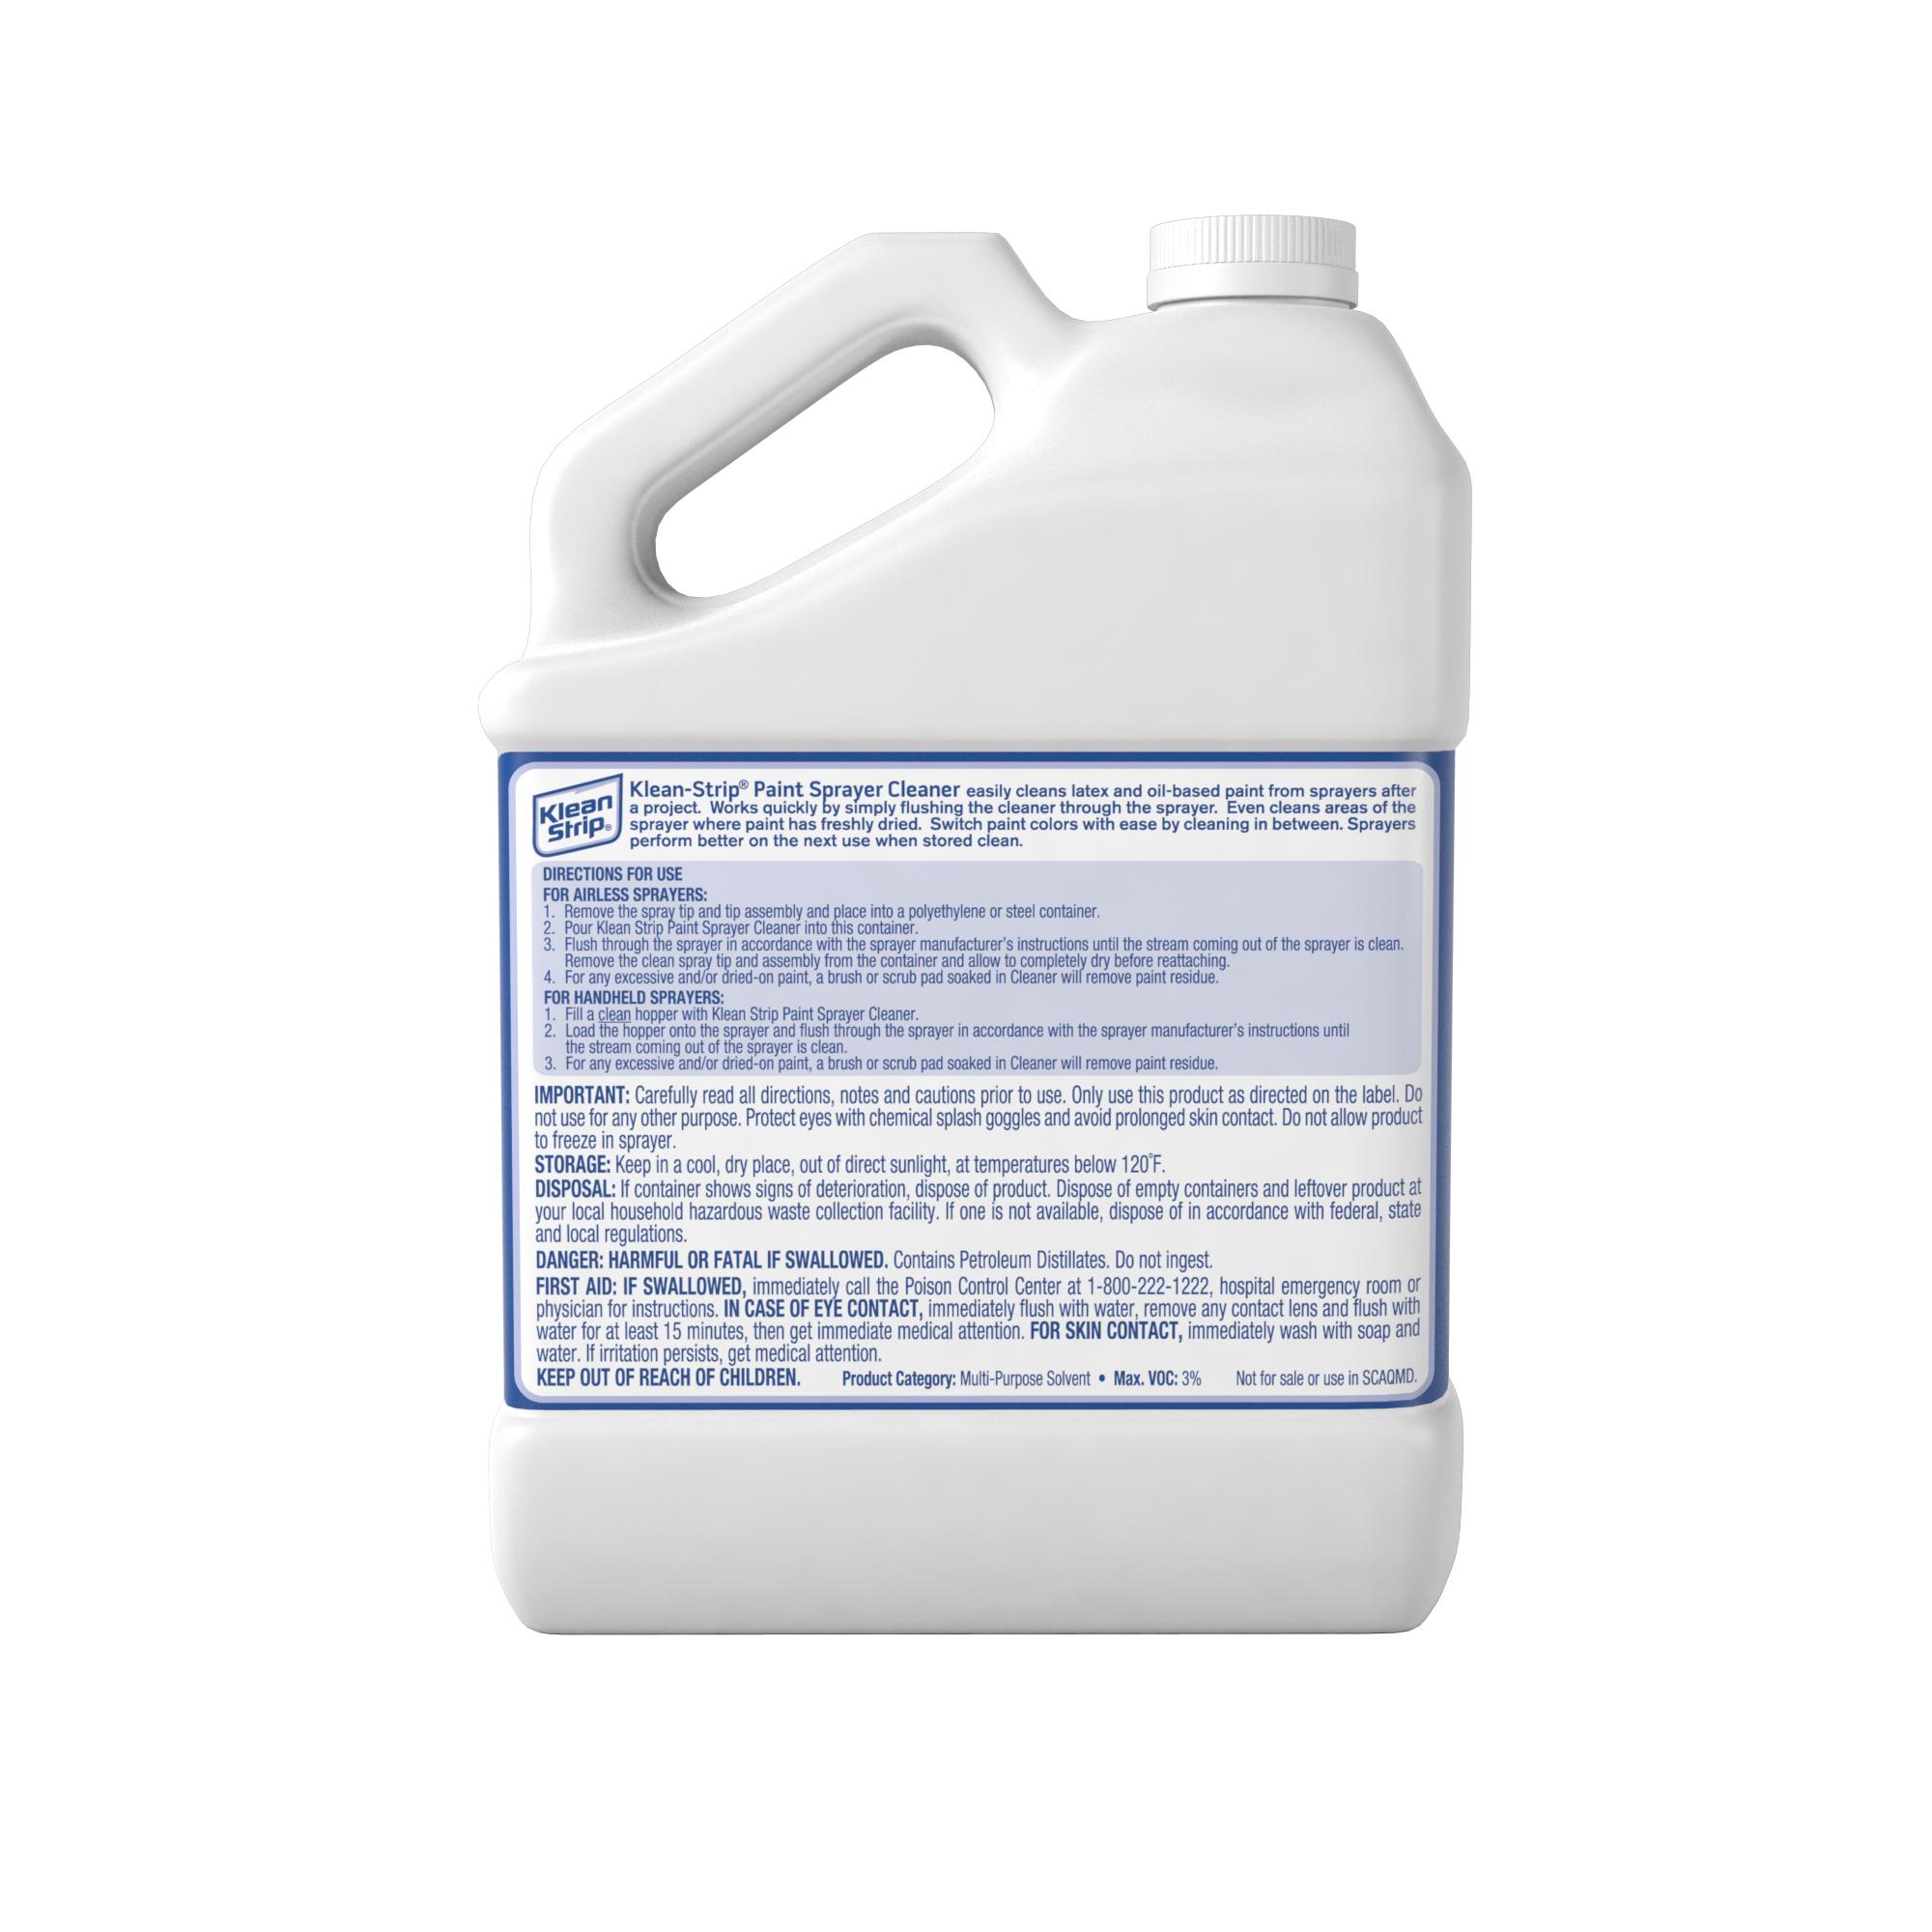 Paint Sprayer Cleaner